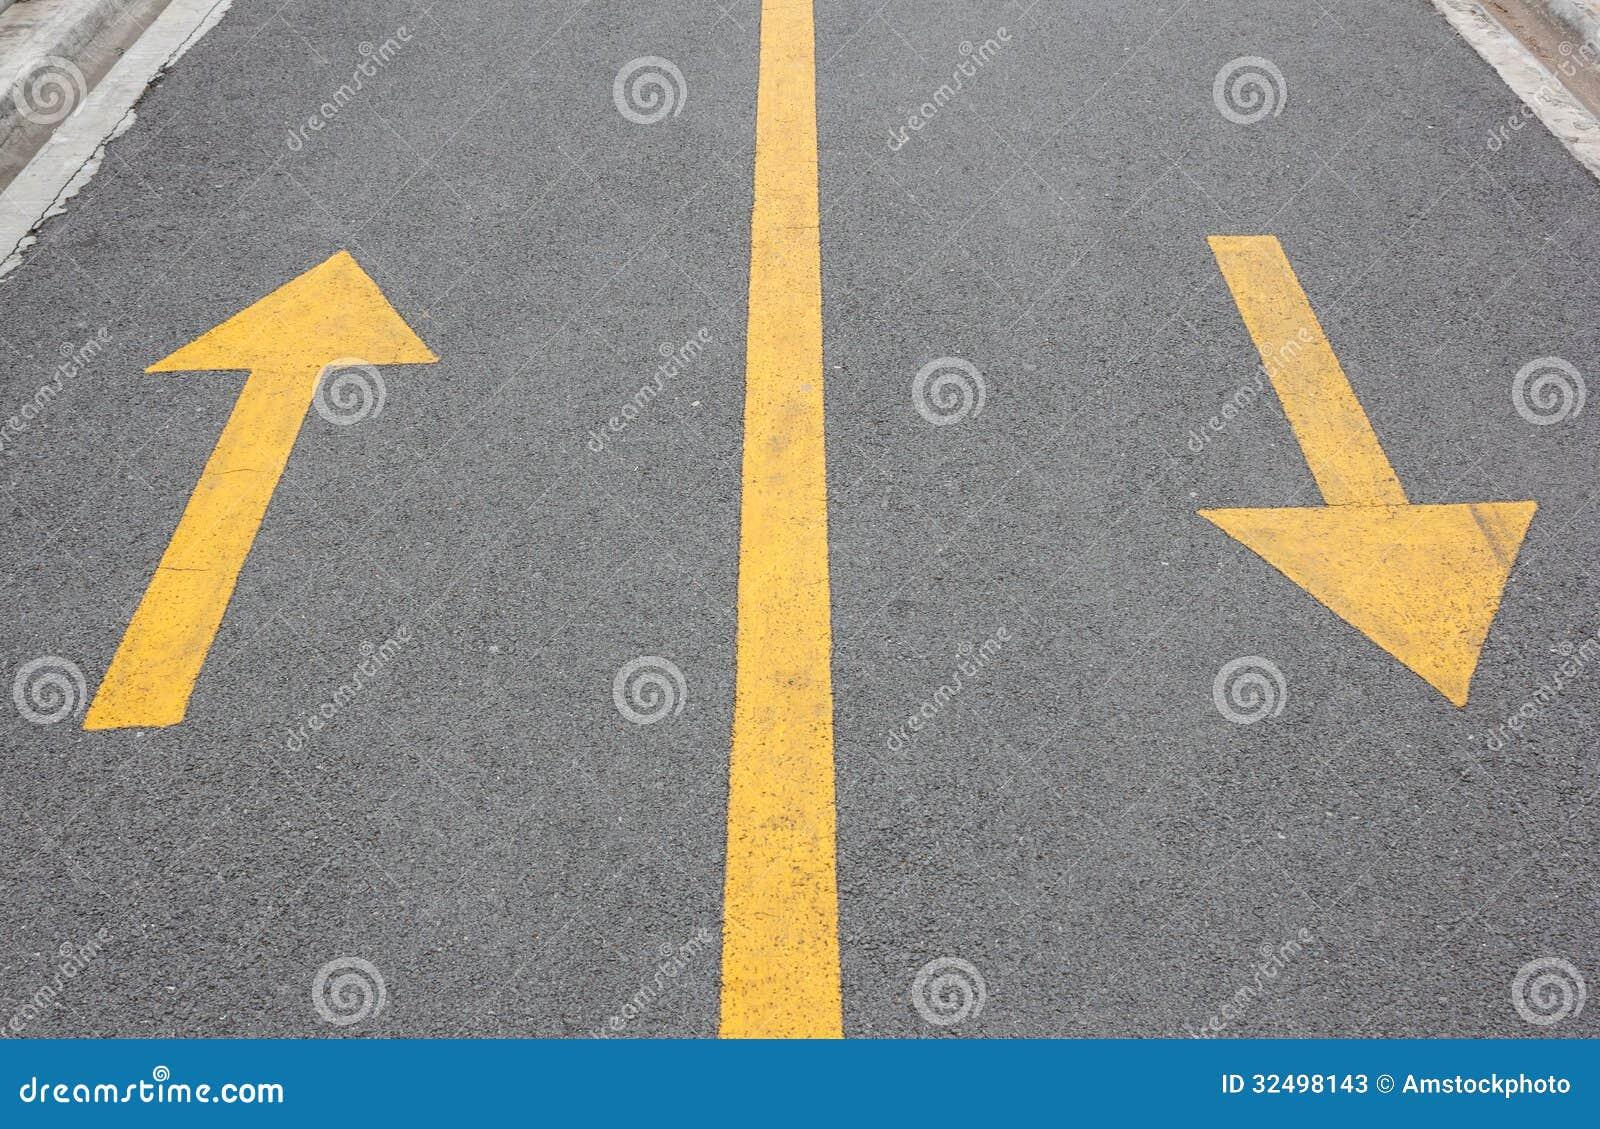 Yellow Arrow Up And Down On Asphalt Street Stock Photos ...